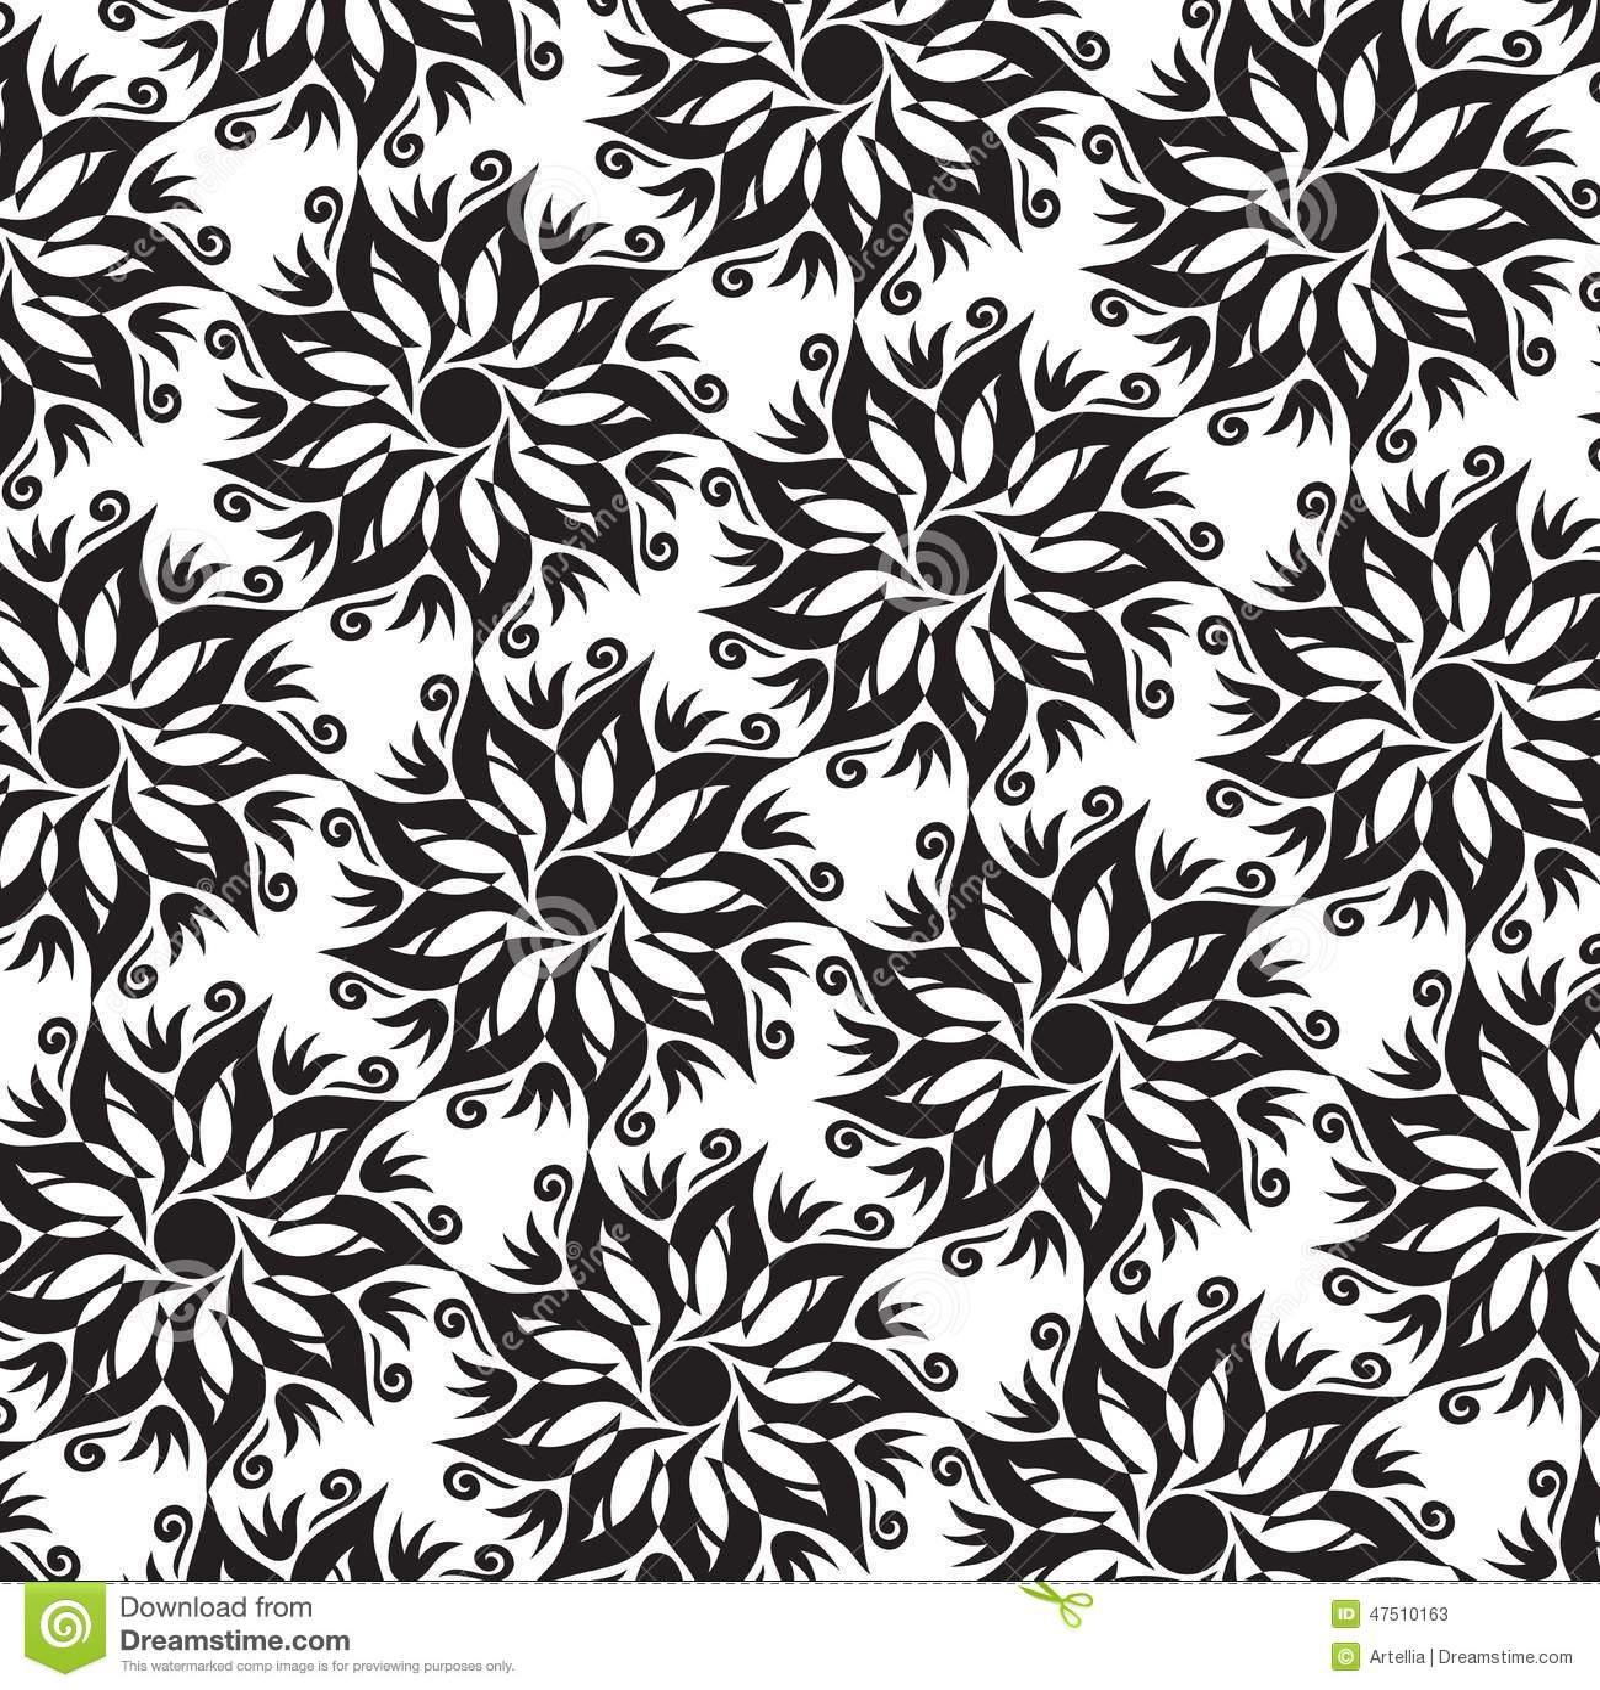 flower mandala seamless pattern black and white colors stock vector image 47510163. Black Bedroom Furniture Sets. Home Design Ideas